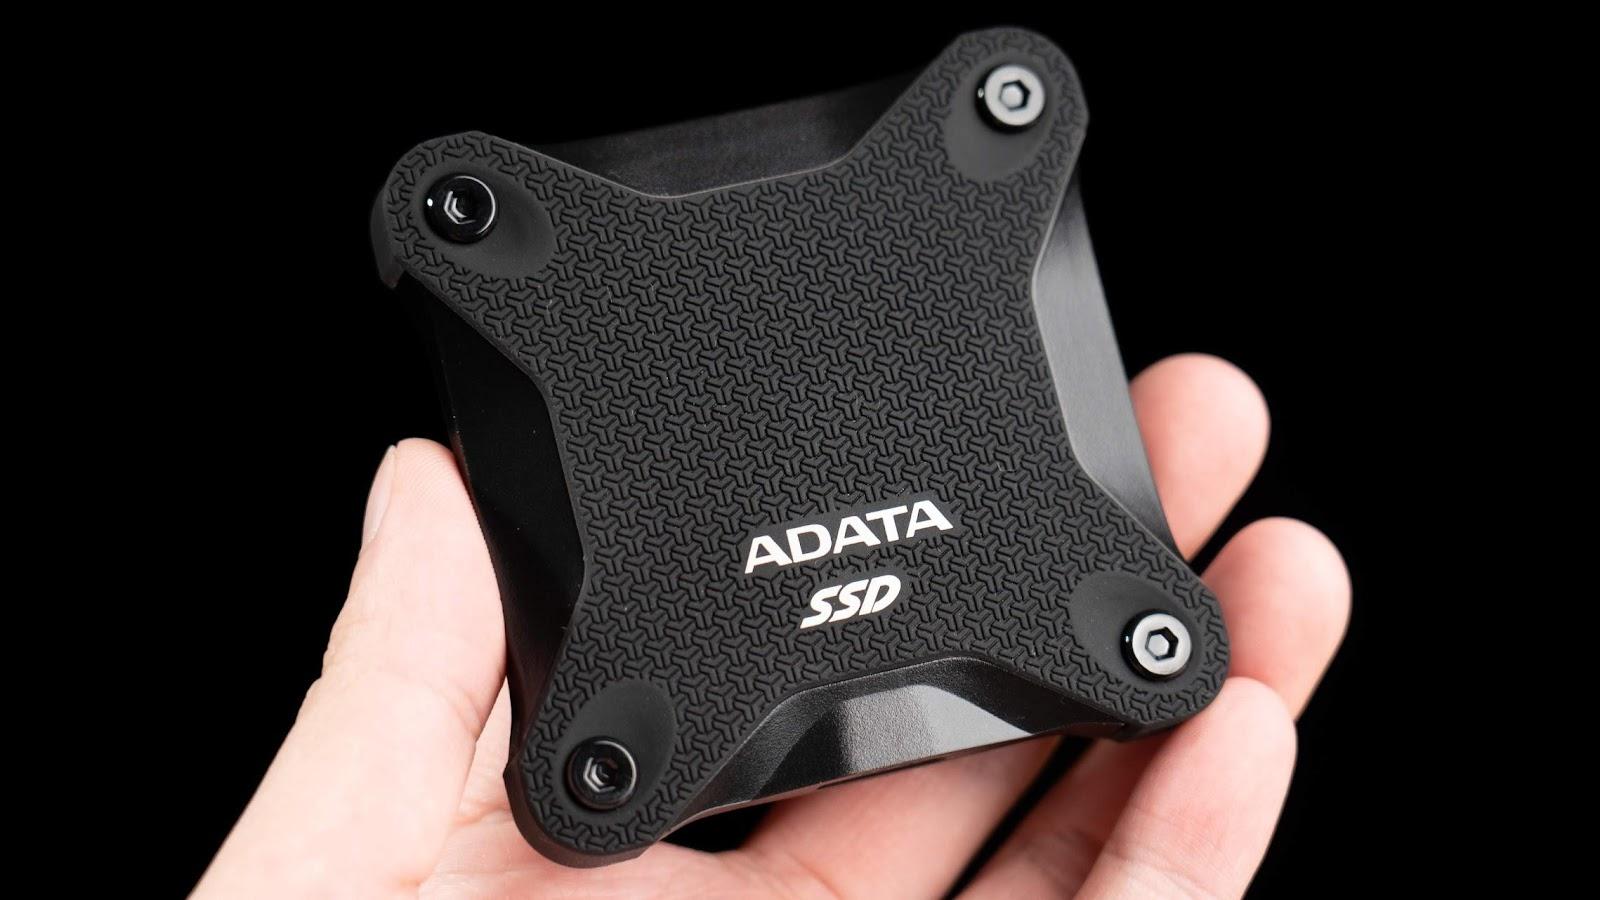 Xbox One X 外接 SSD 遊戲實測 ADATA SD600Q 外接式固態硬碟開箱